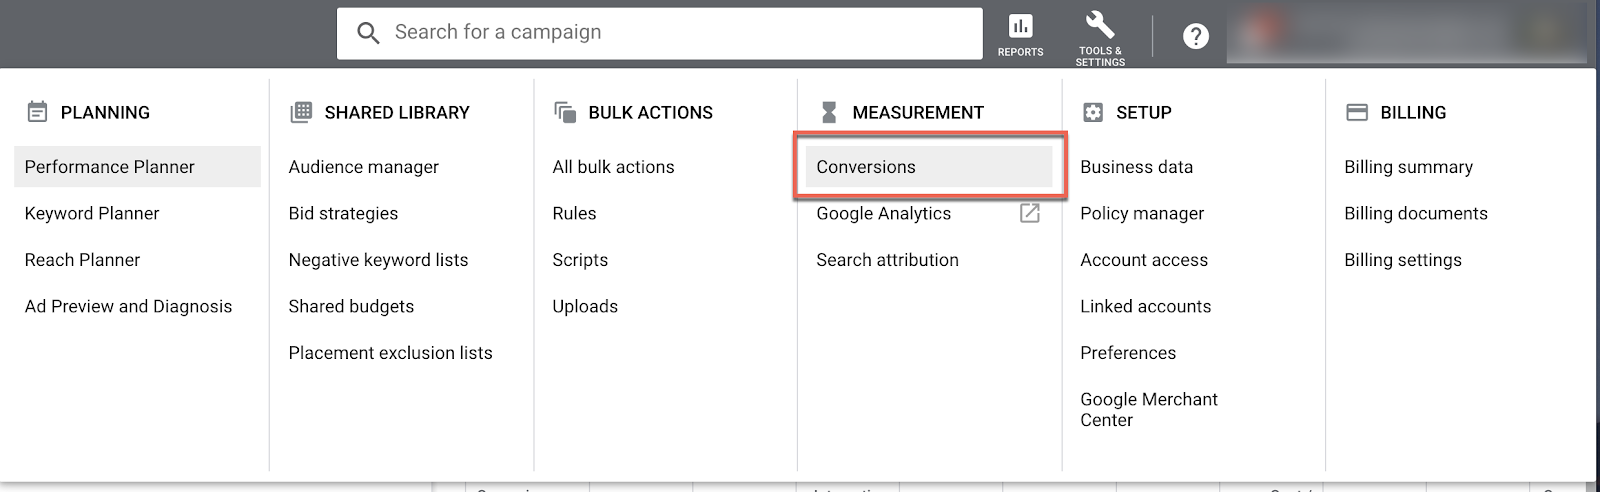 google ads conversion attribution